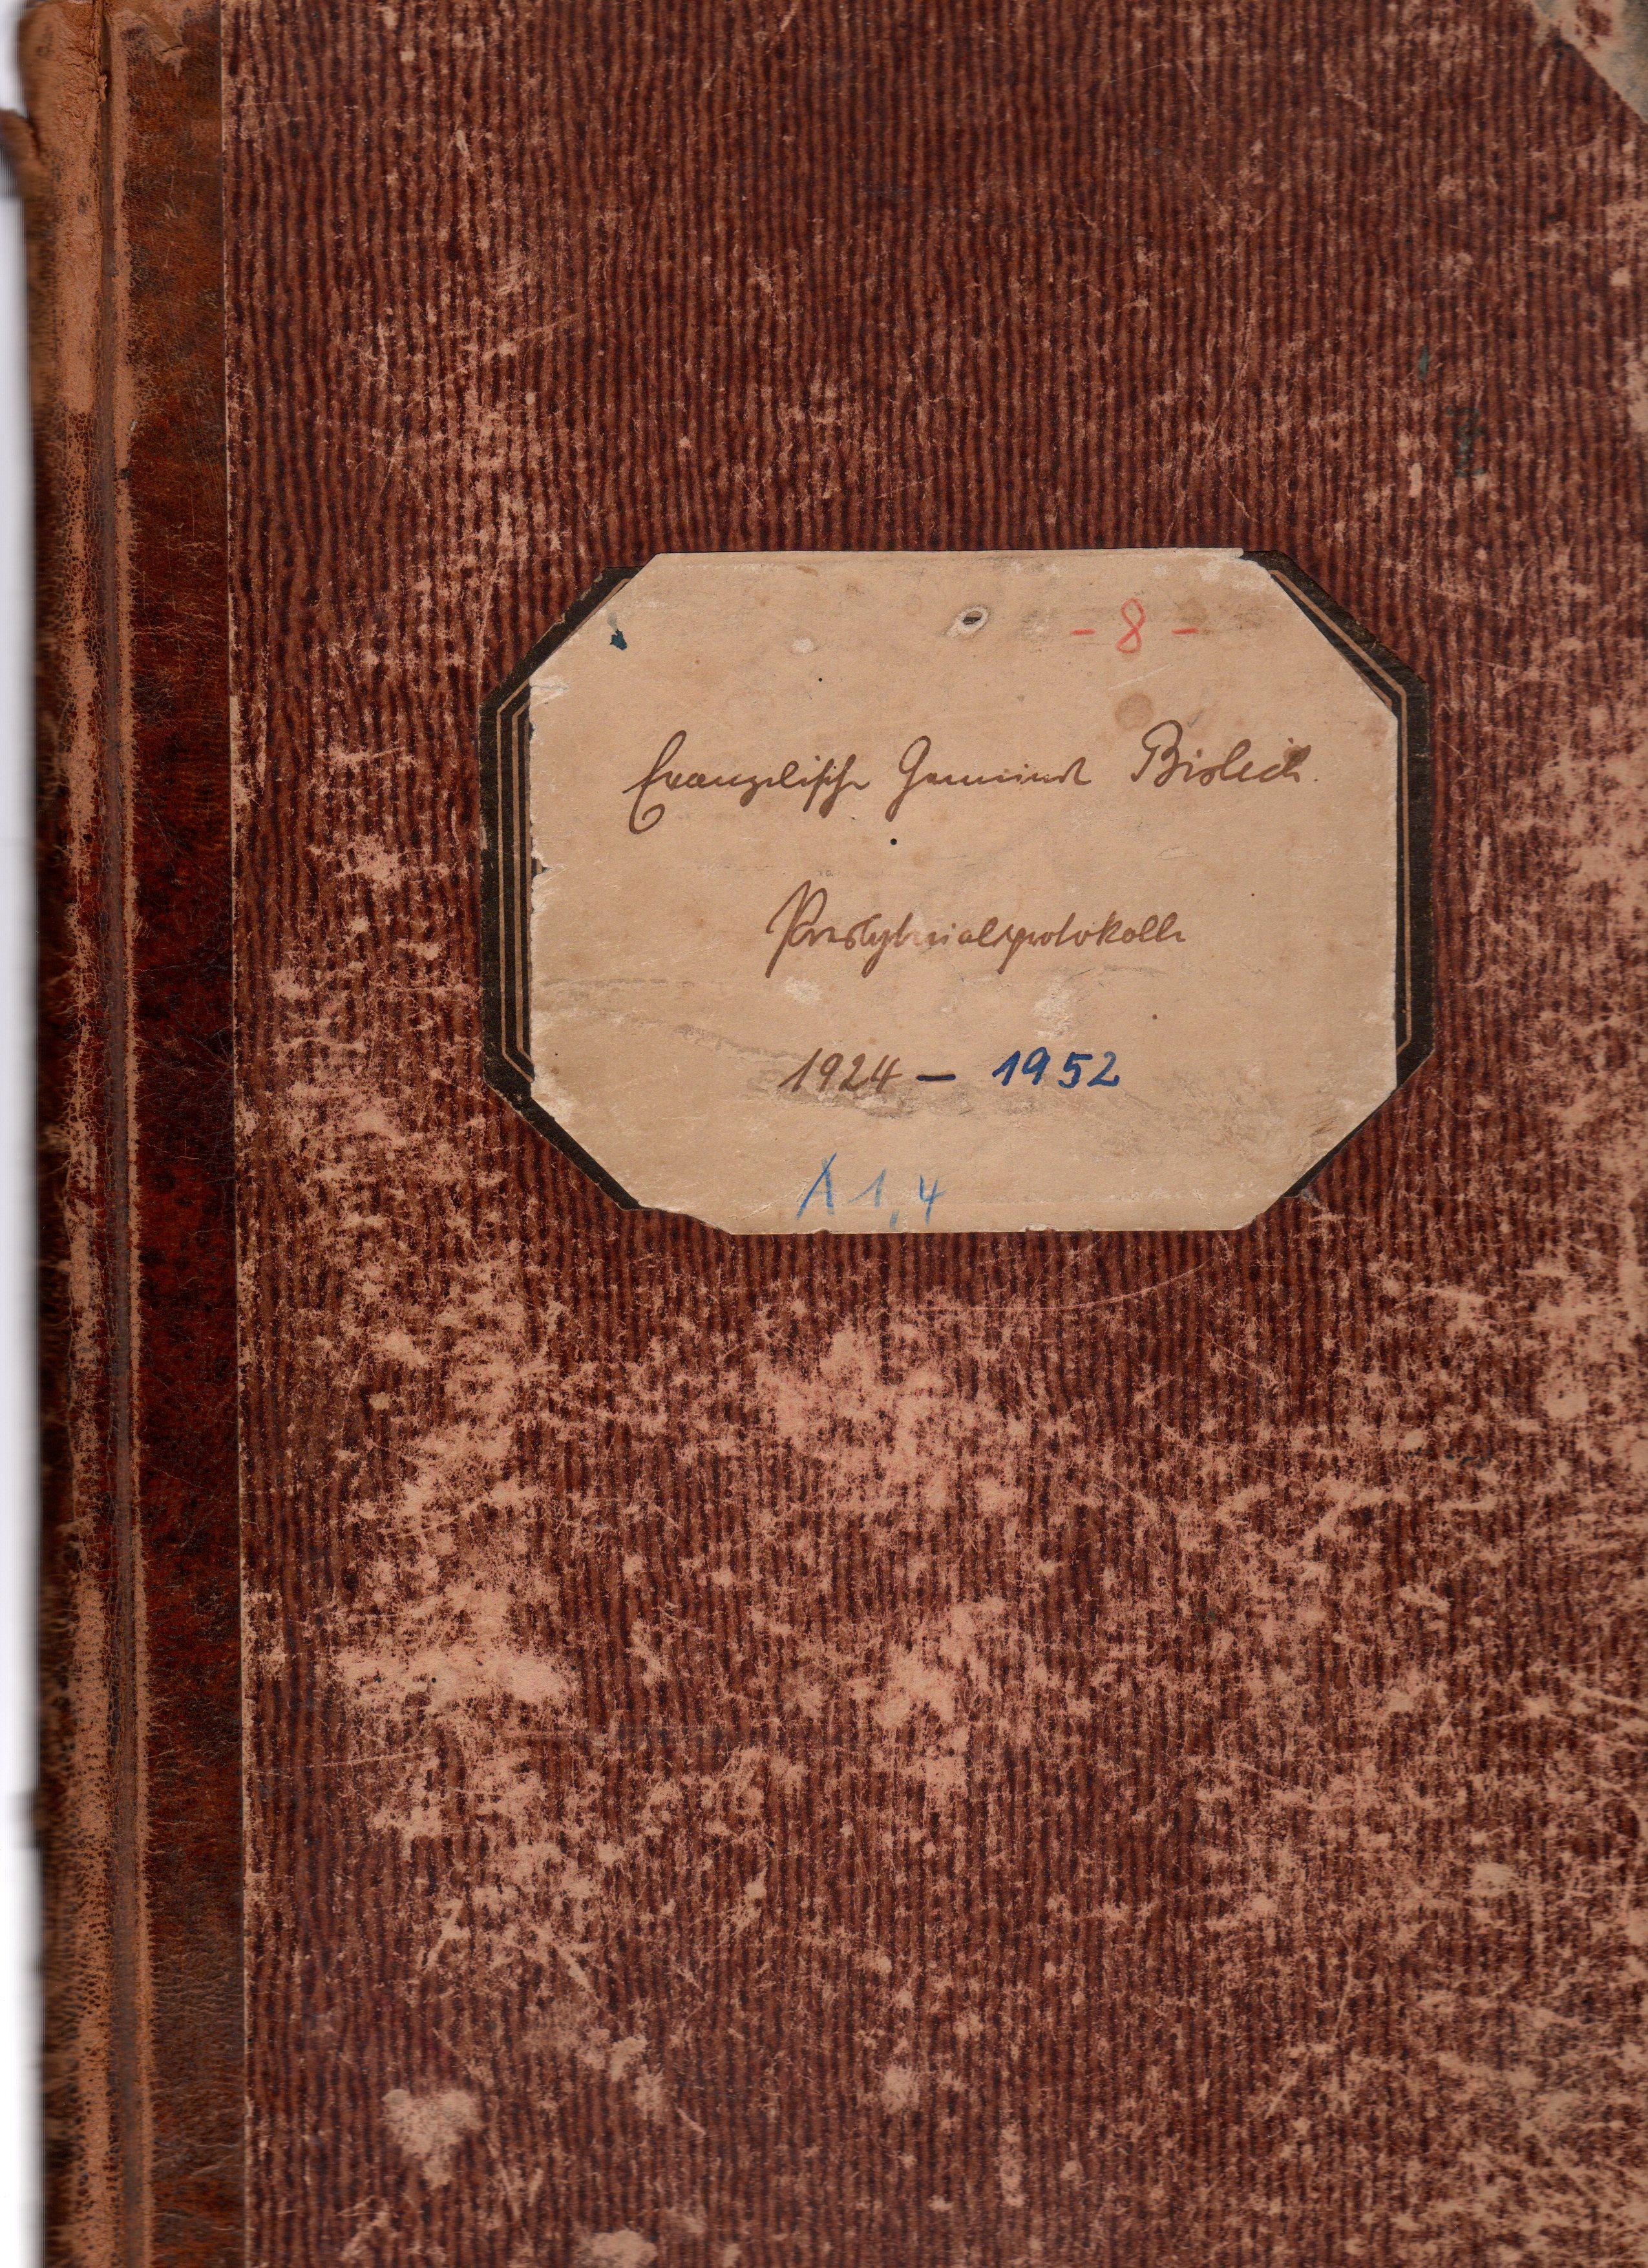 Presbyteriumsprotokoll Bislich 1924-1952